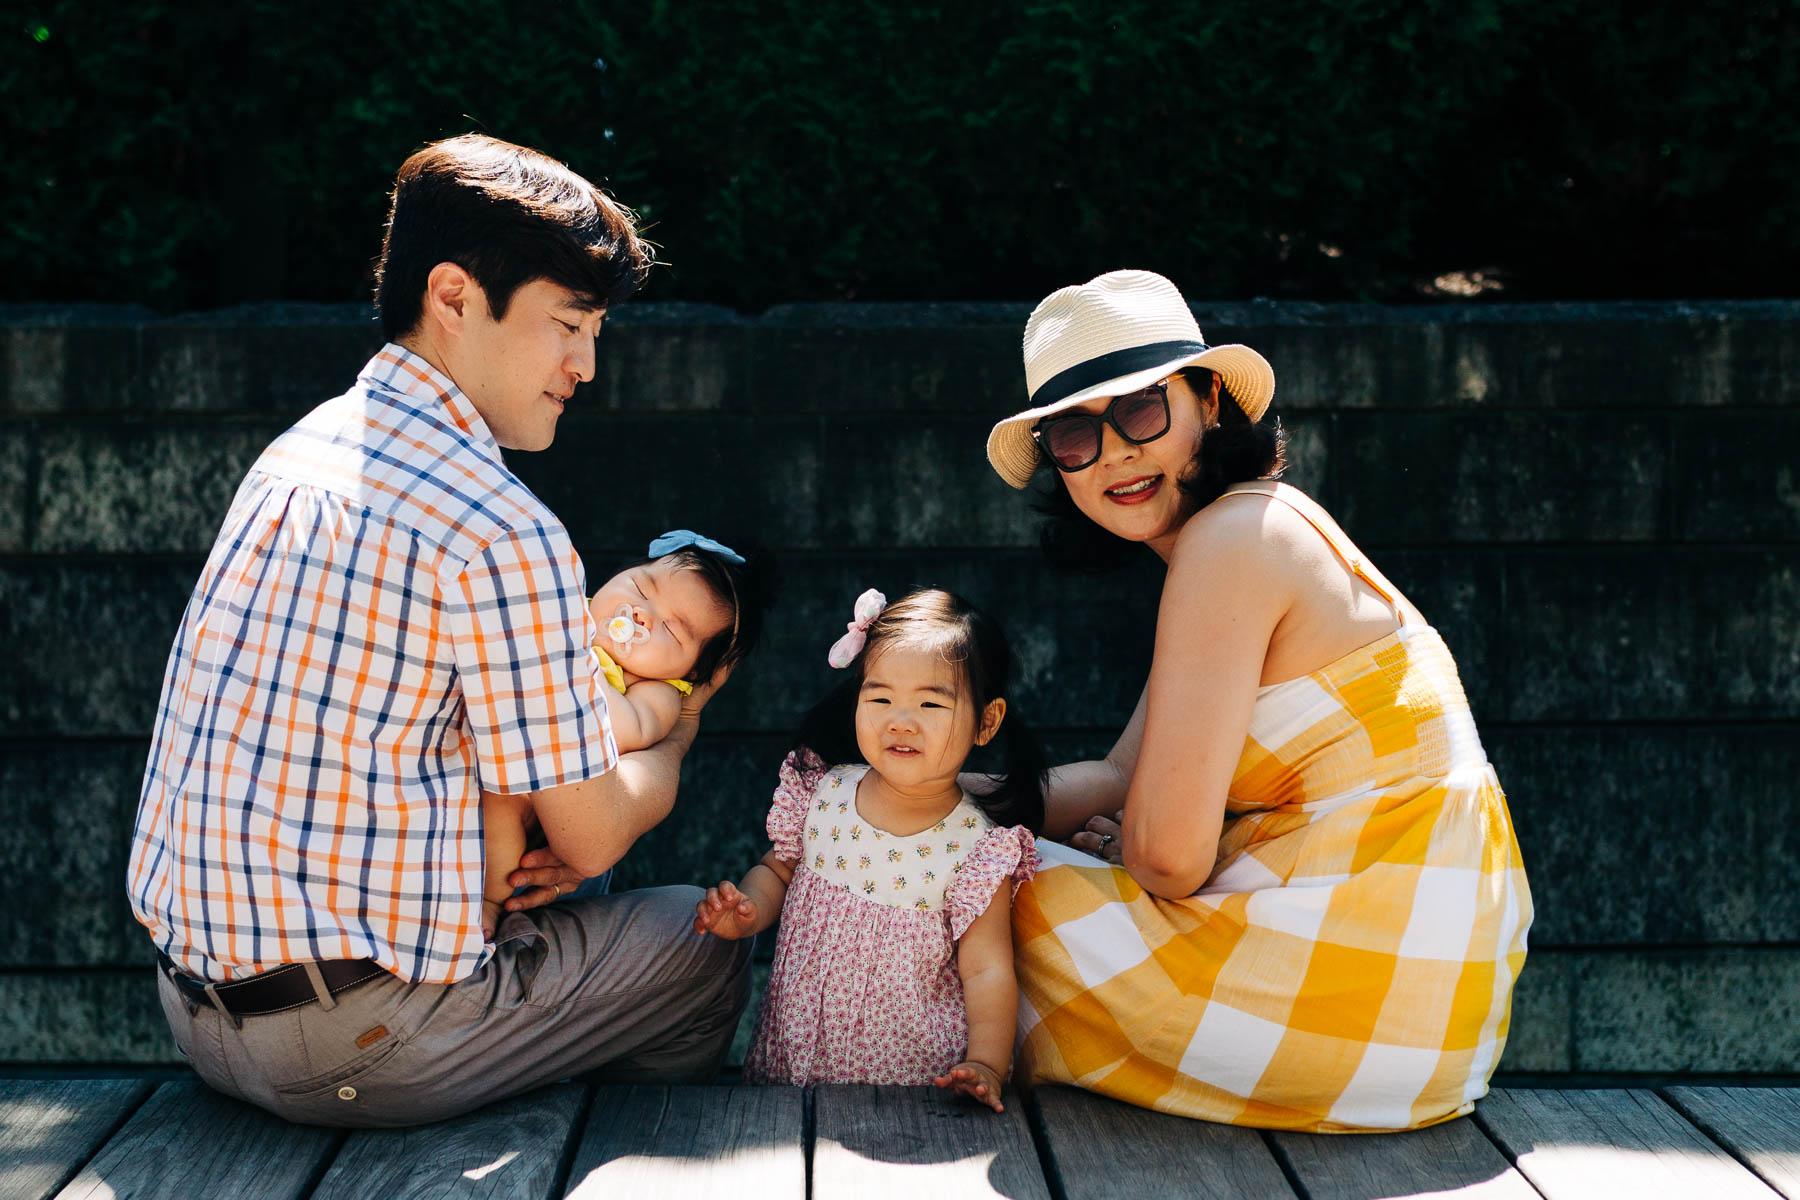 chicago-family-lifestyle-photographer-23.jpg